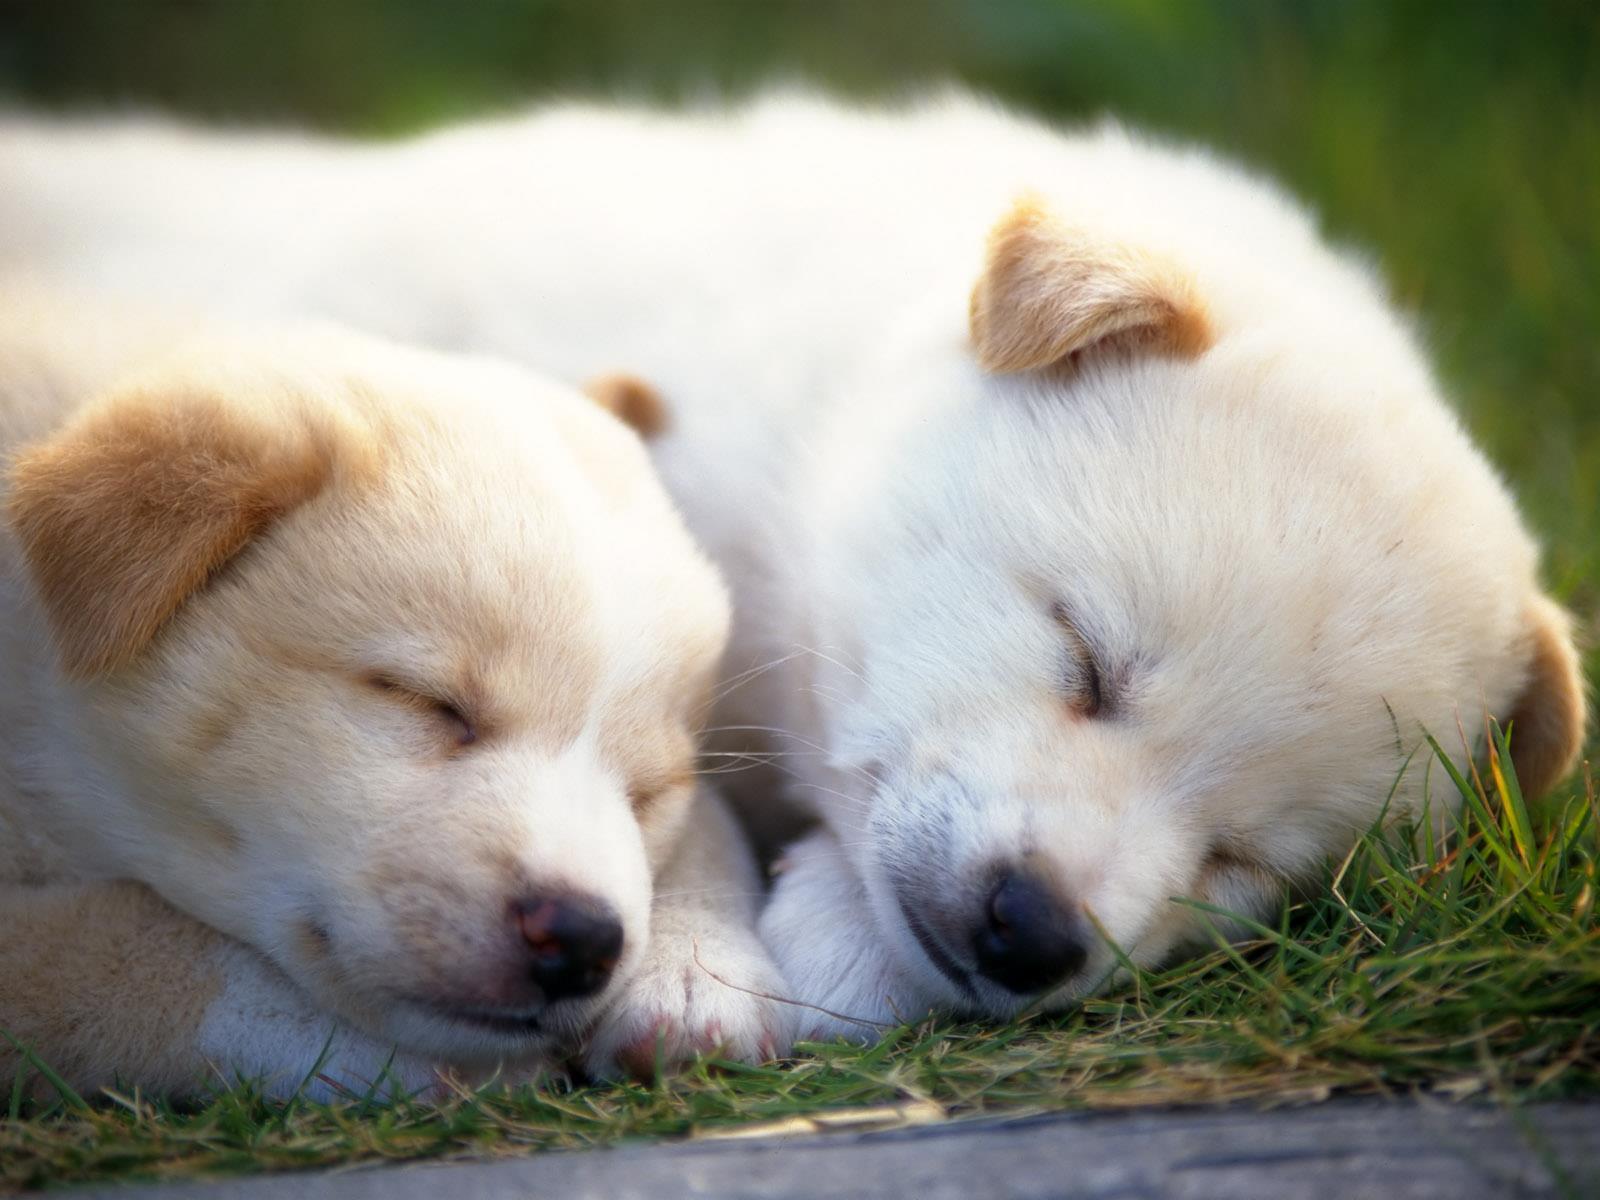 fond-ecran-chiots-adopter-gratuit-photos-3